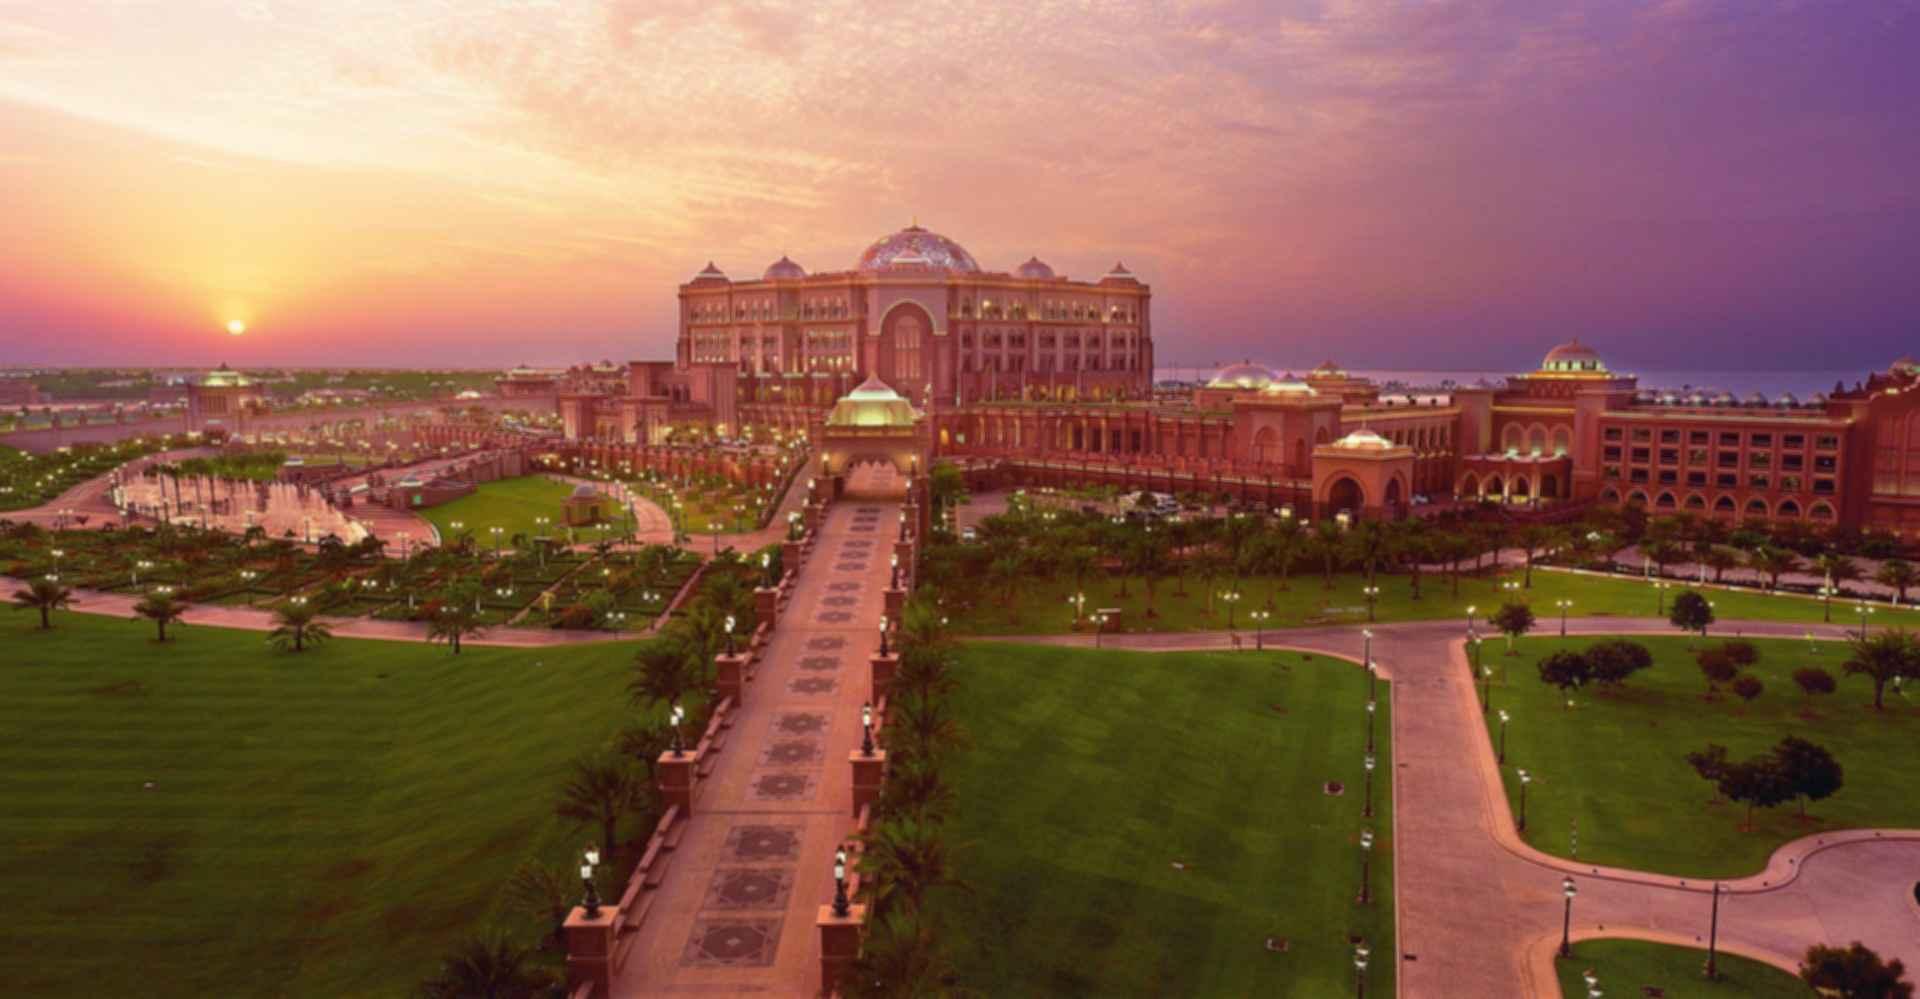 Emirates Palace - Bird's Eye View